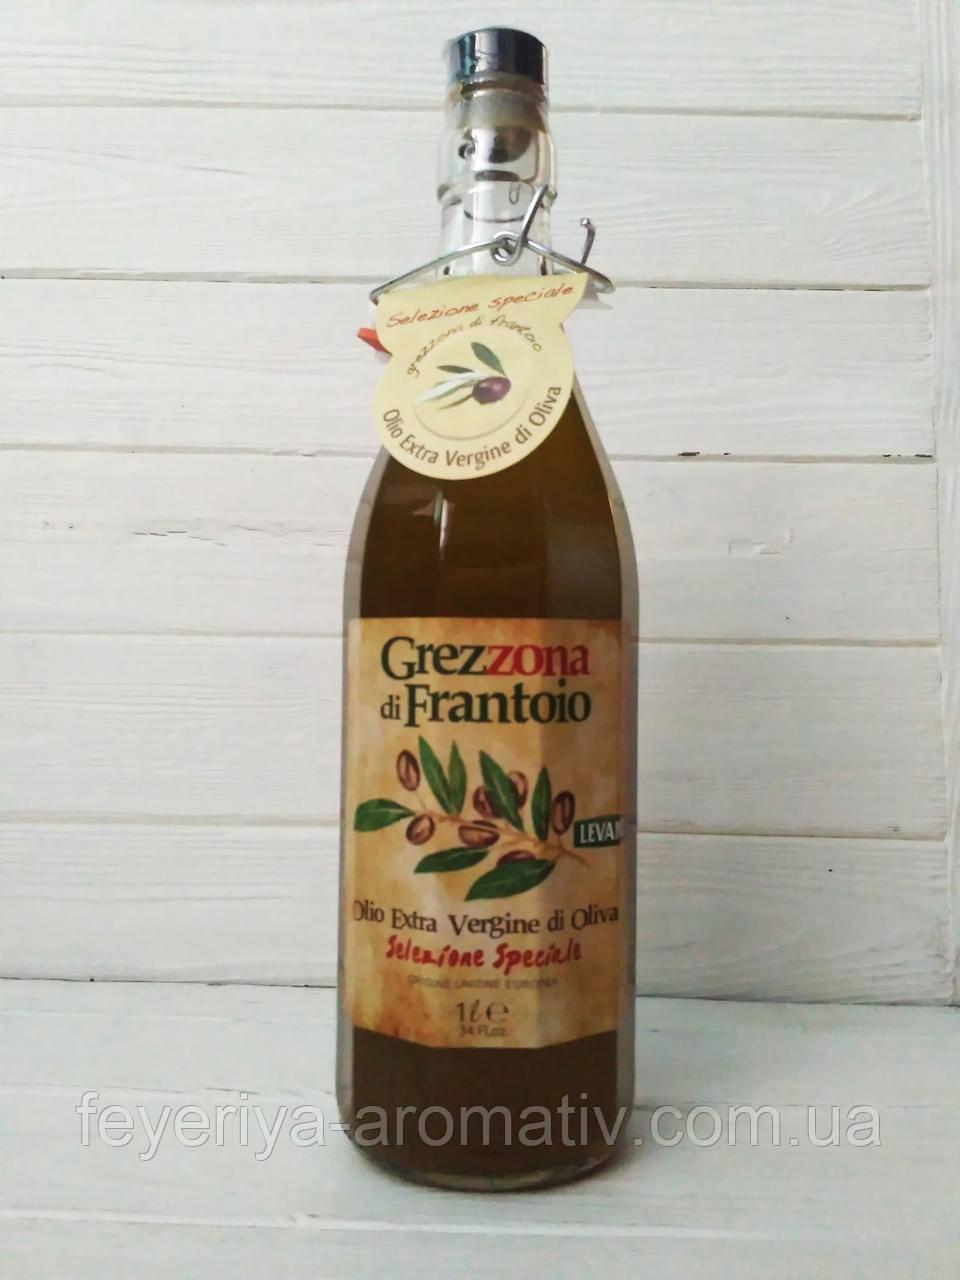 Оливковое масло Levante Grezzona di Frantoio Olio Extra Vergine di oliva Selezione speciale  1л (Италия)